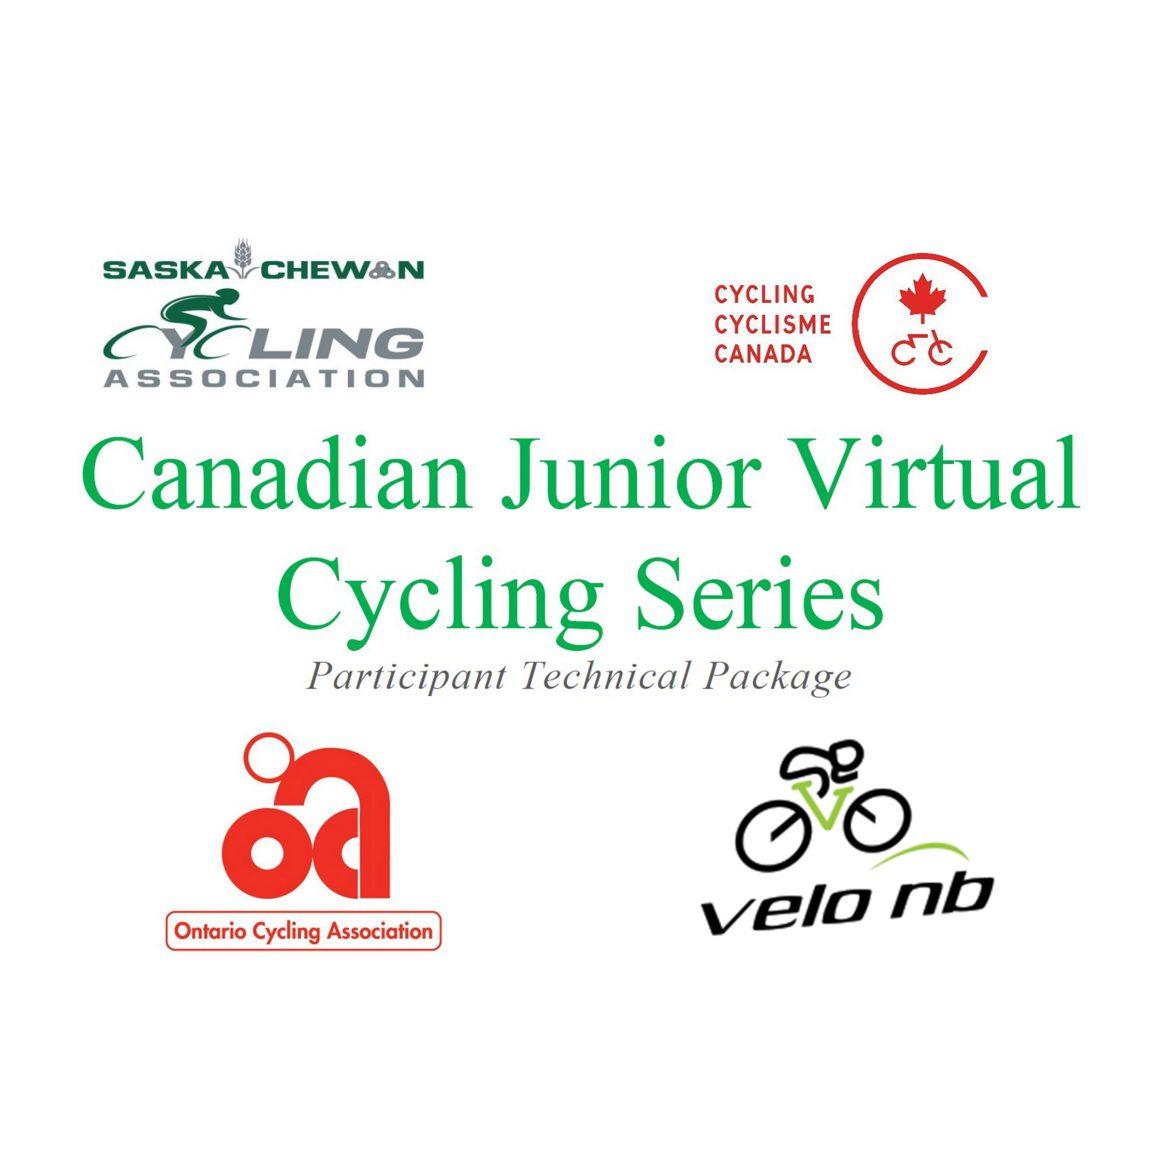 Canadian Junior Virtual Cycling Series